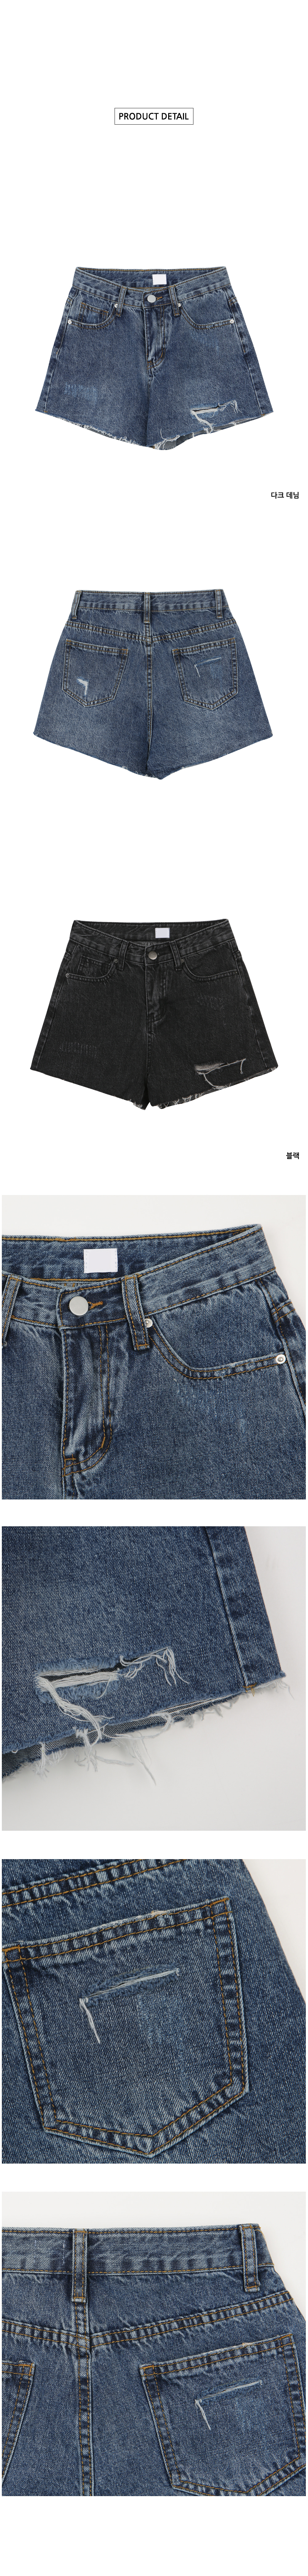 Belt set cutting denim short pants P#YW480